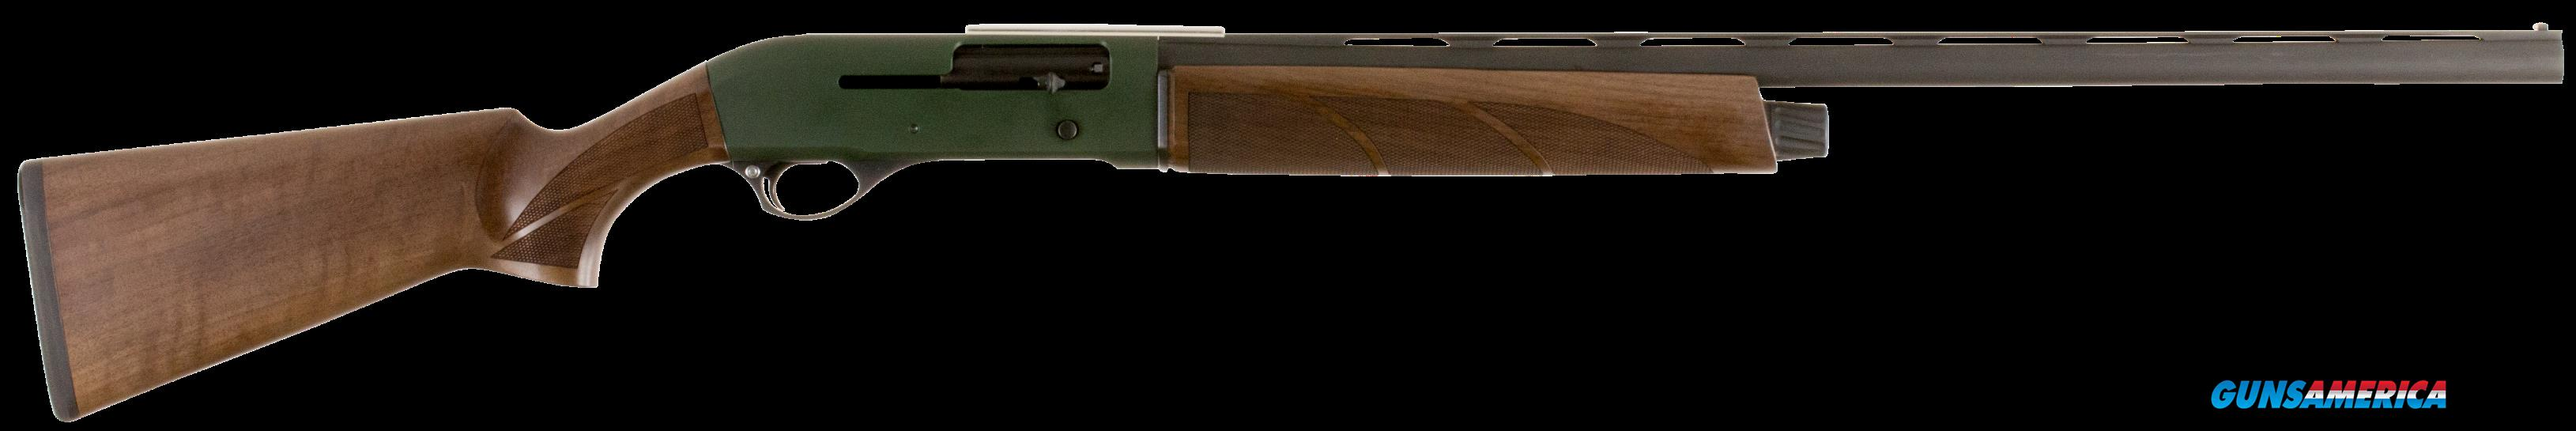 Cz Cz 712, Cz 06432 712 G2         12 28 Ct5 Matt Grn  Guns > Pistols > 1911 Pistol Copies (non-Colt)